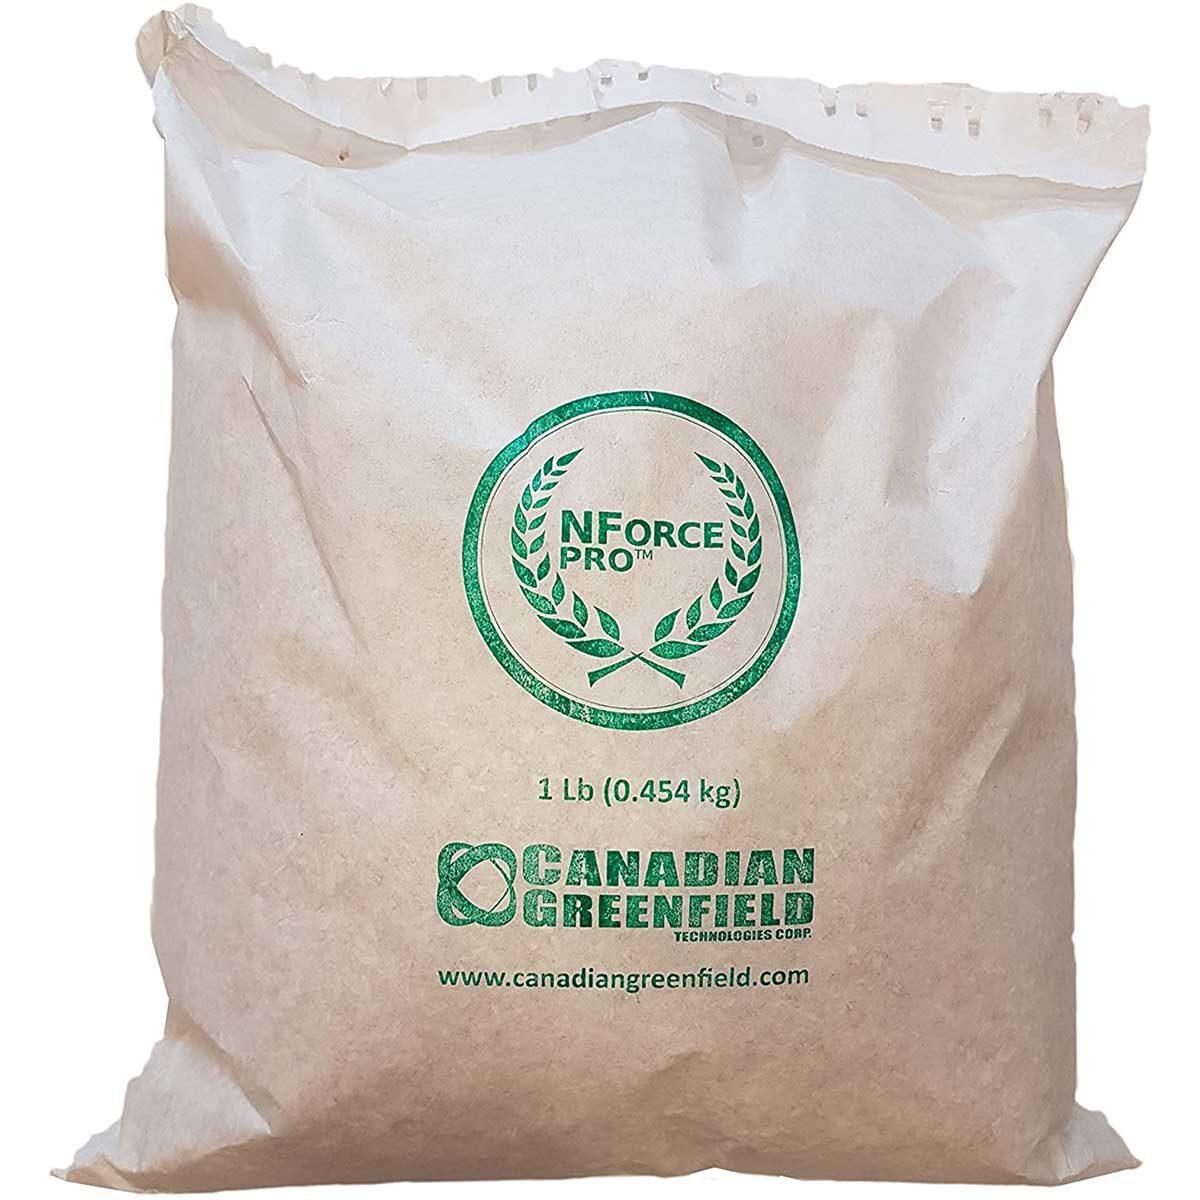 Cement reinforcing fibers